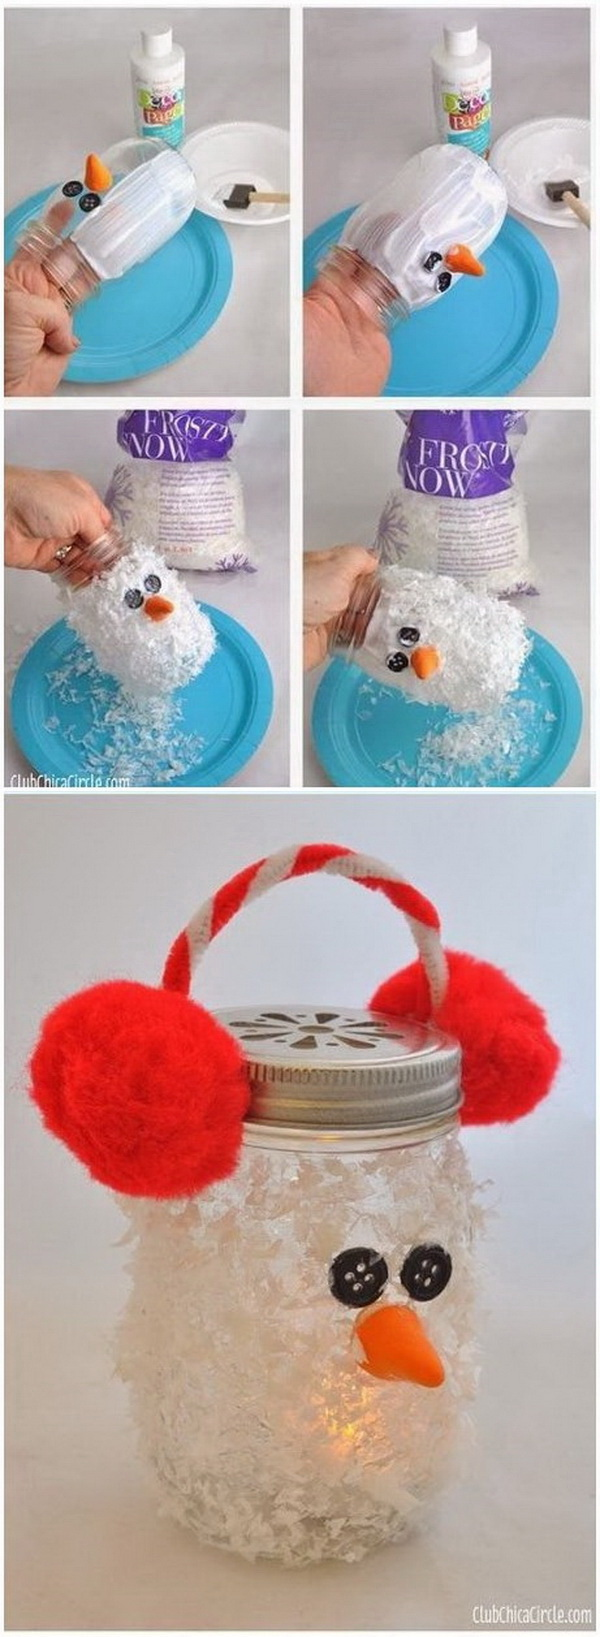 DIY Snowman Mason Jar Luminary. This snowman mason jar luminary is so much fun and festive. Perfect for Christmas or just winter decor!